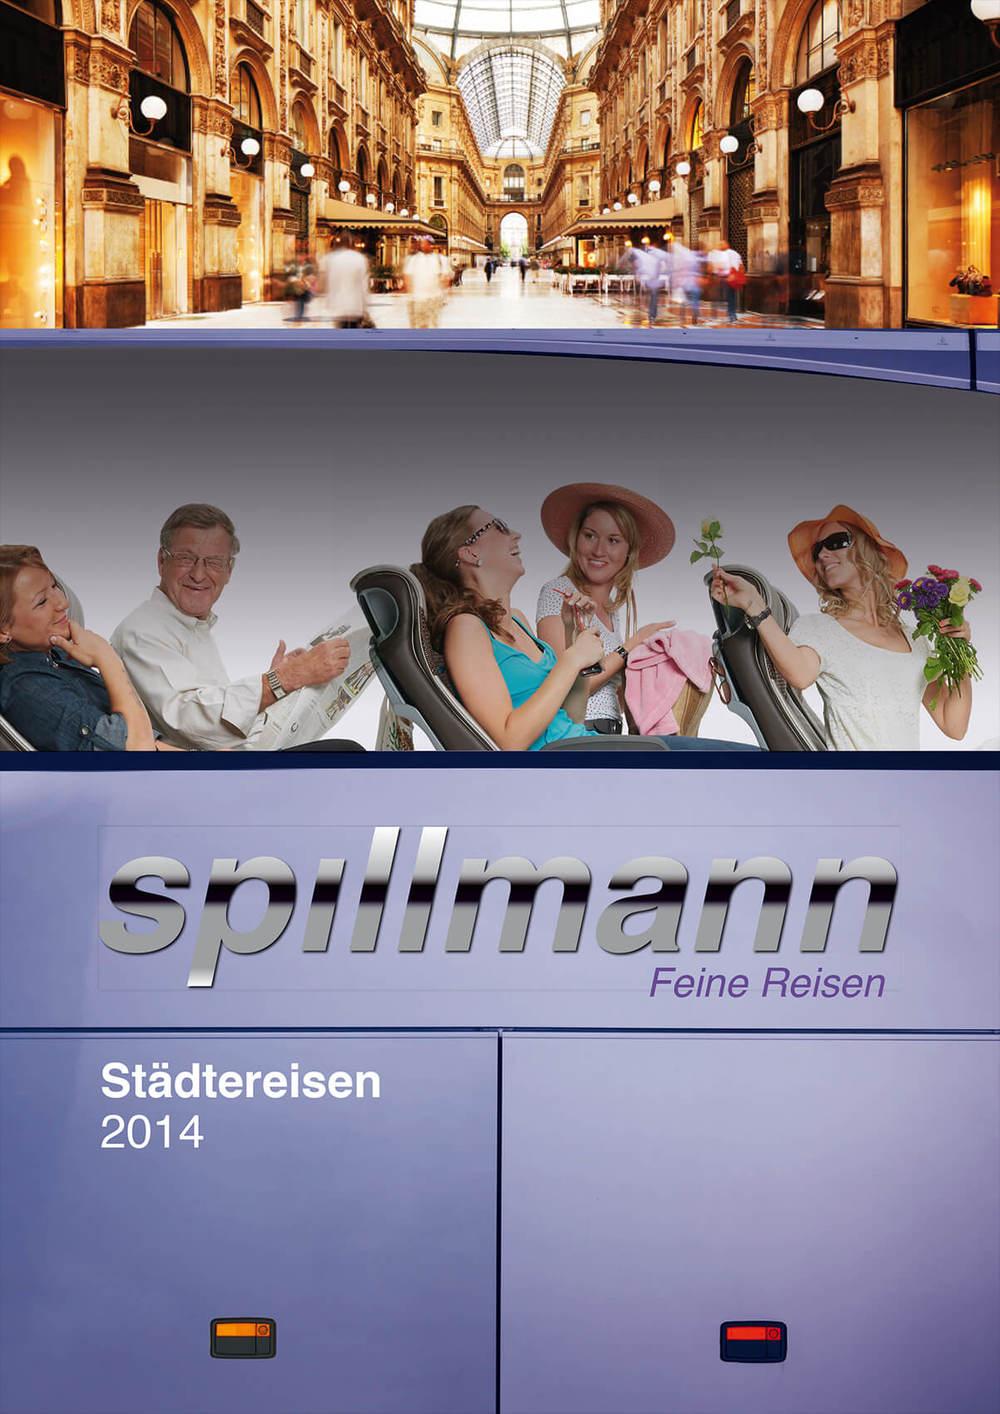 städte-reisekatalog-spillmann-agentur-intermar-corporate.jpg